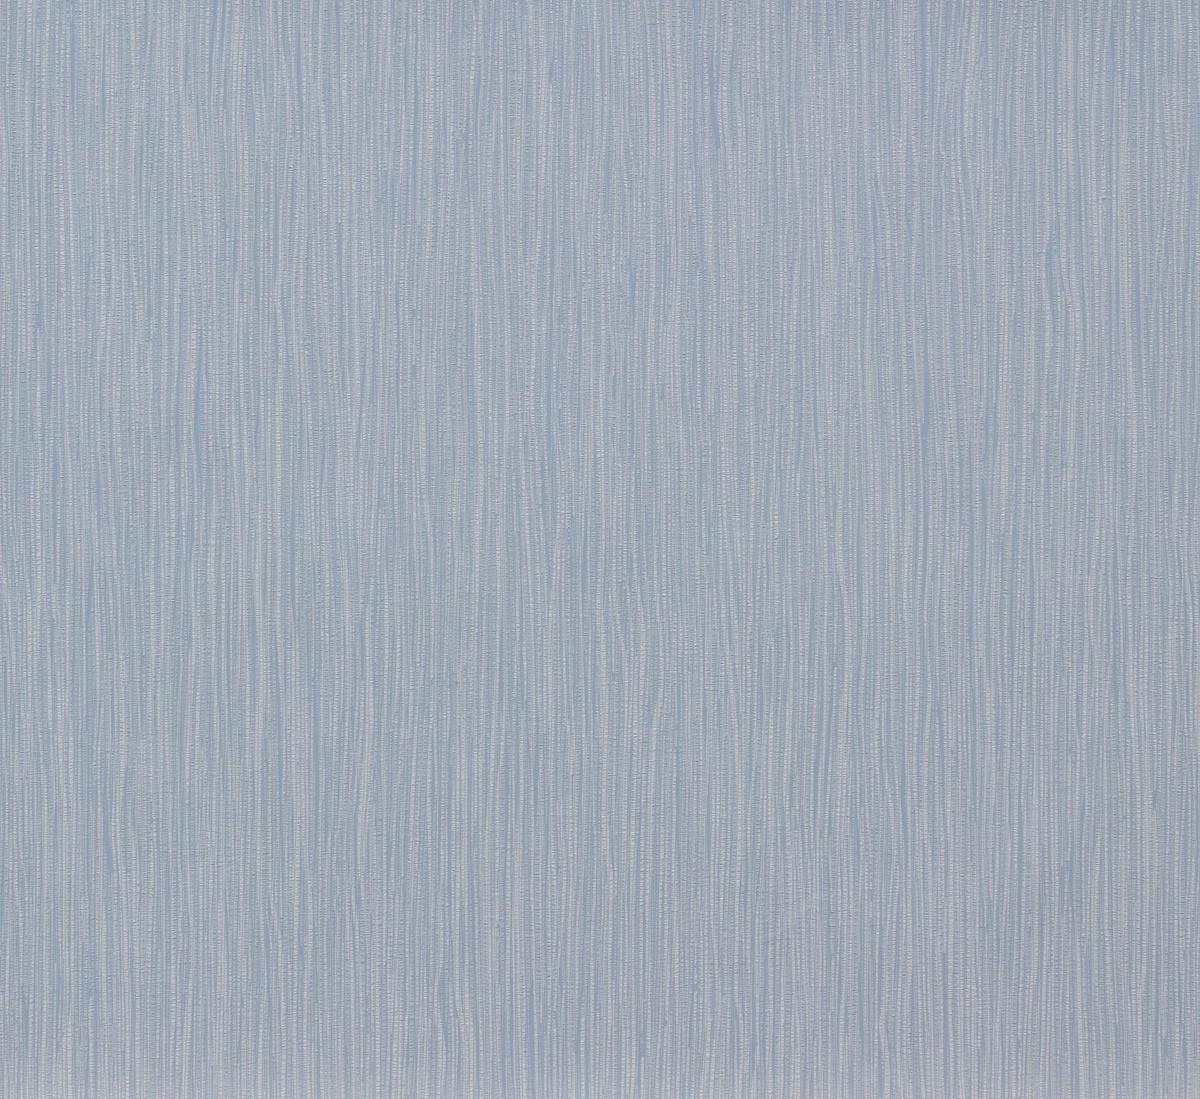 tapete vlies streifen blau marburg 56535. Black Bedroom Furniture Sets. Home Design Ideas